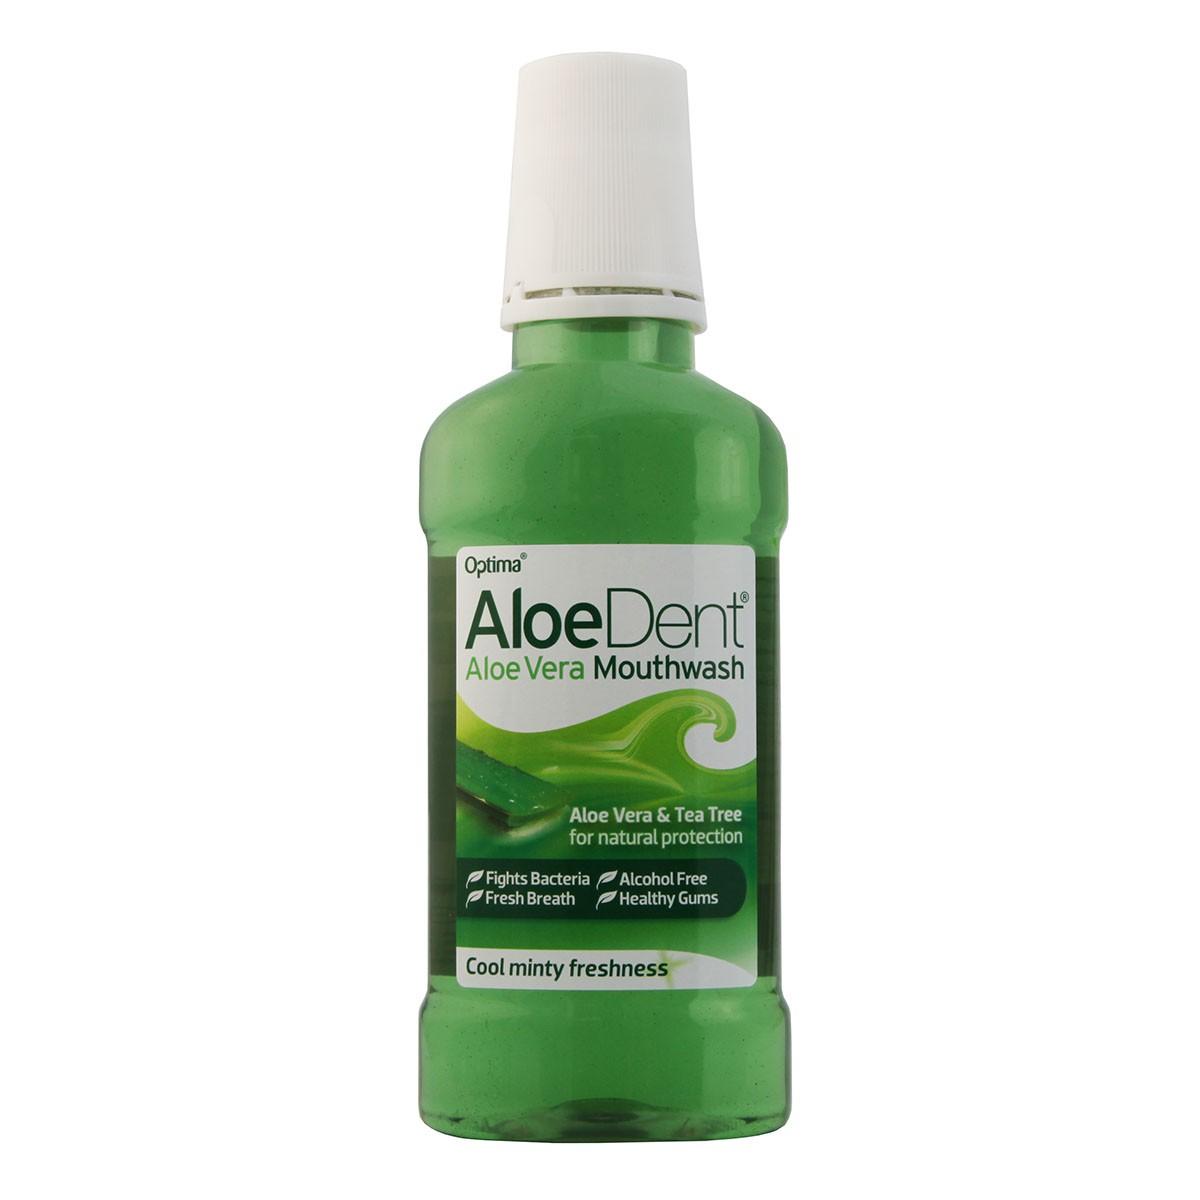 AloeDent Aloe Vera & Tea Tree Mouthwash